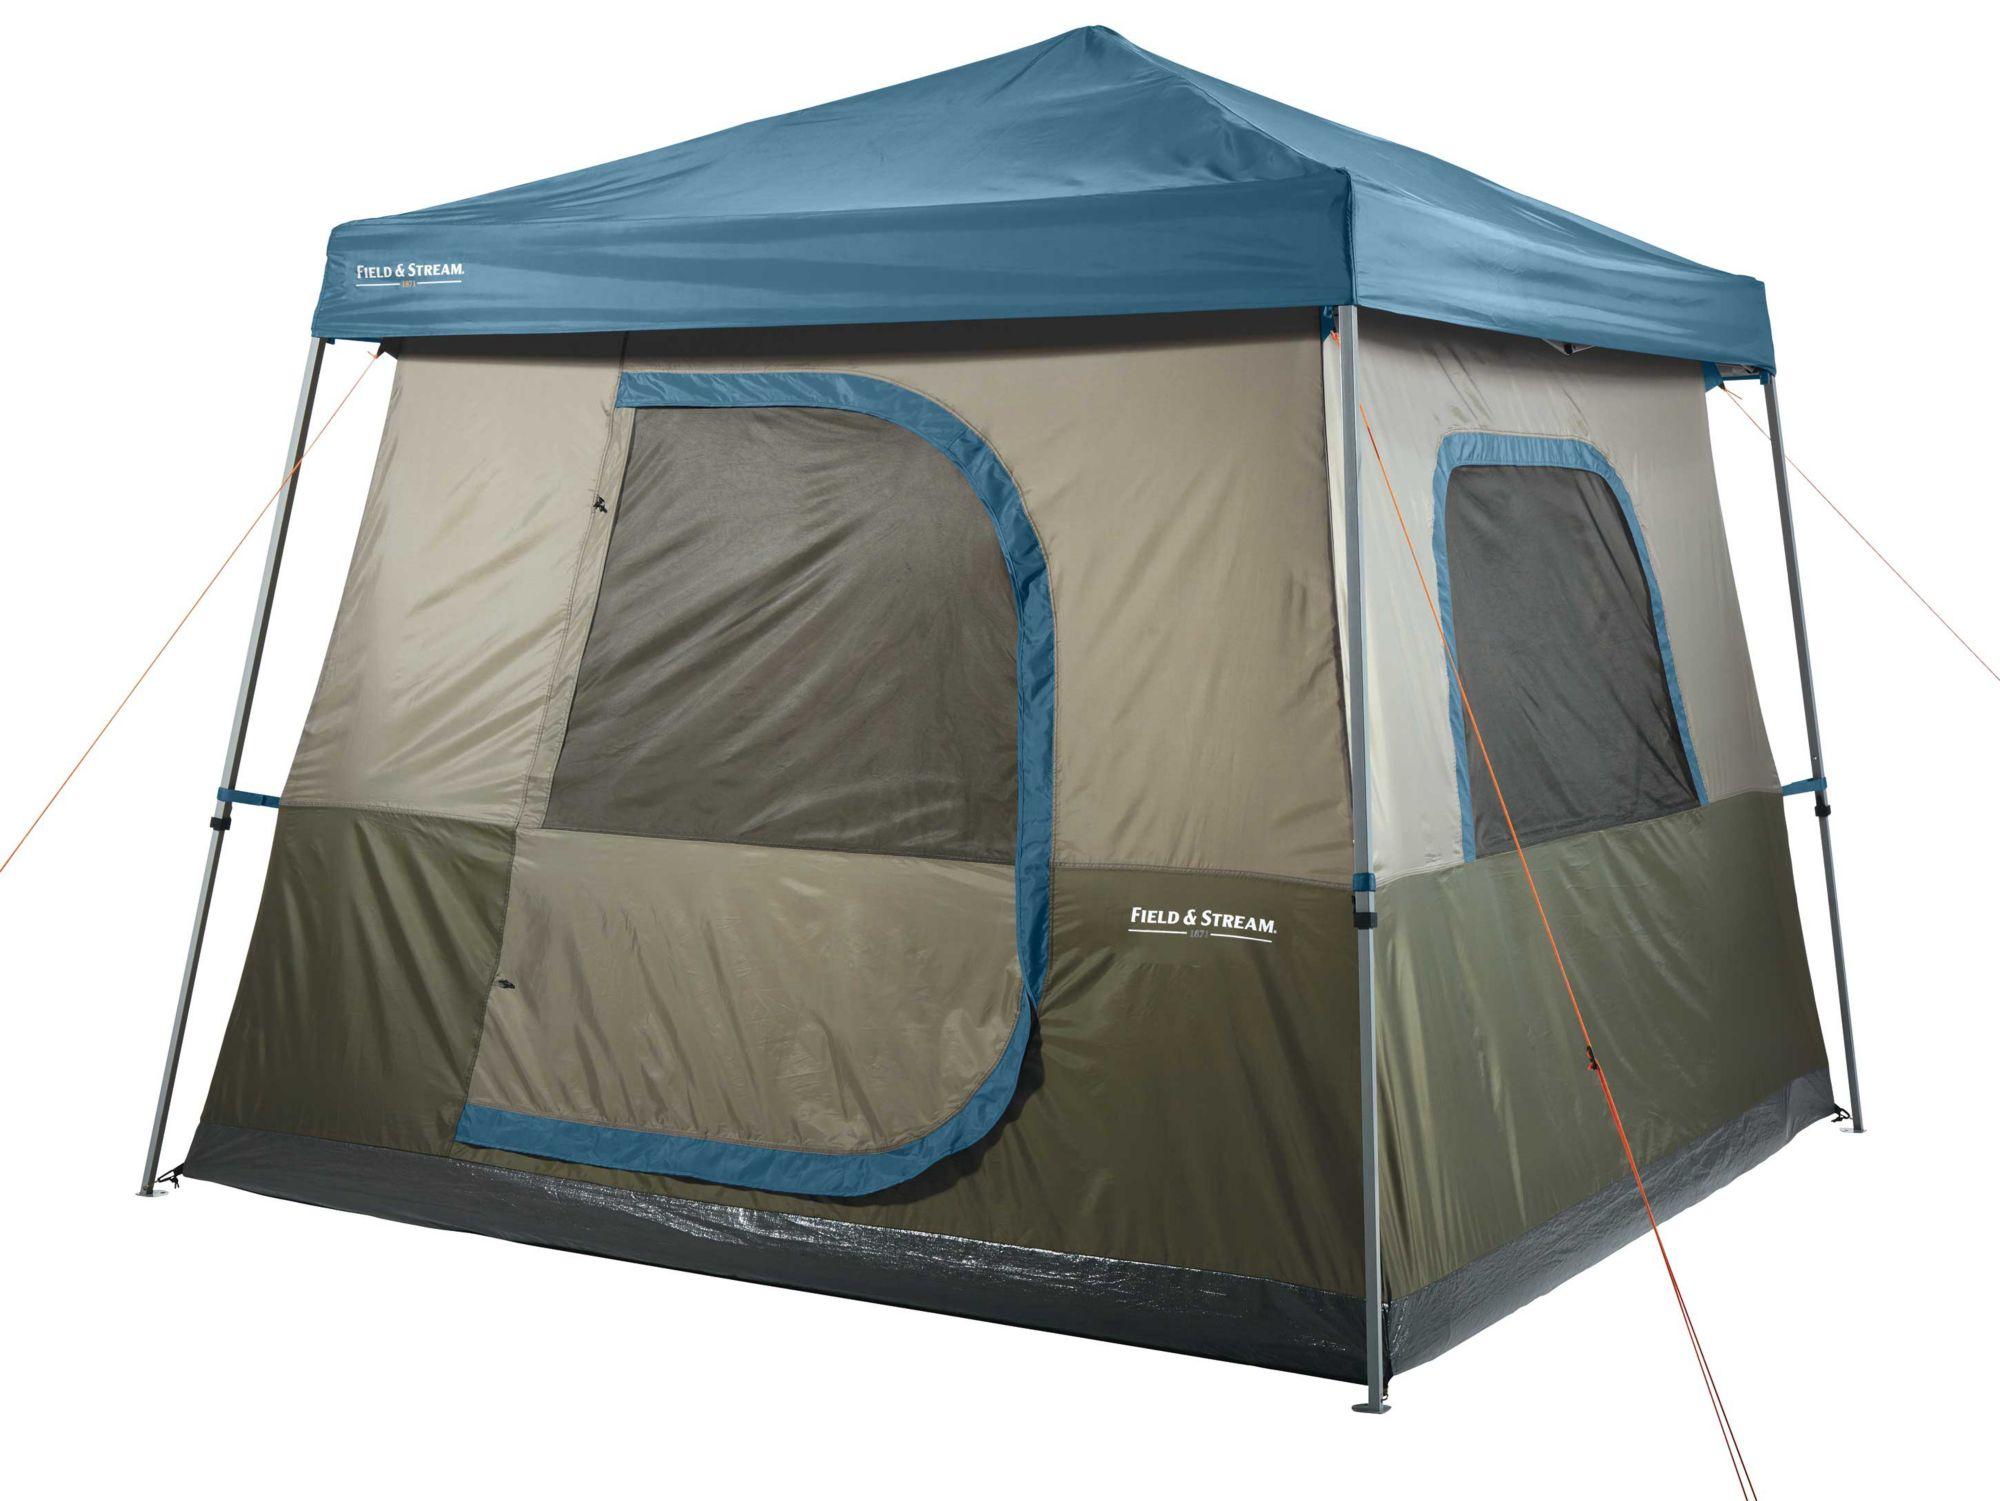 1  sc 1 st  DICKu0027S Sporting Goods & Field u0026 Stream 5 Person Canopy Tent | DICKu0027S Sporting Goods